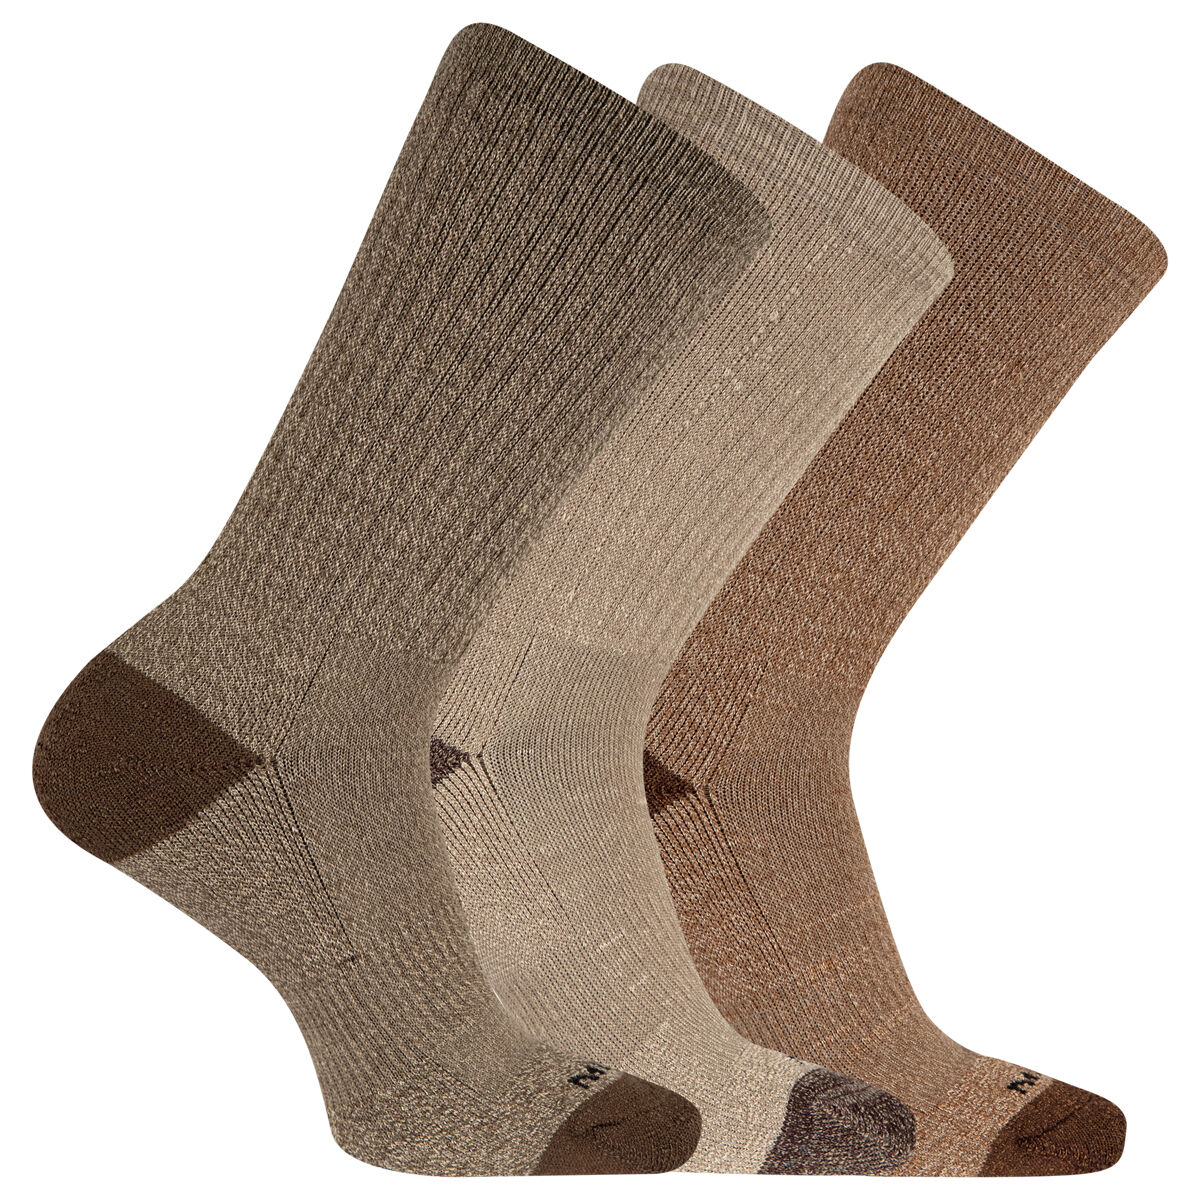 Merrell Men's Cushioned Crew-Length Performance Hiker Socks, 3-Pack - Green, L/XL